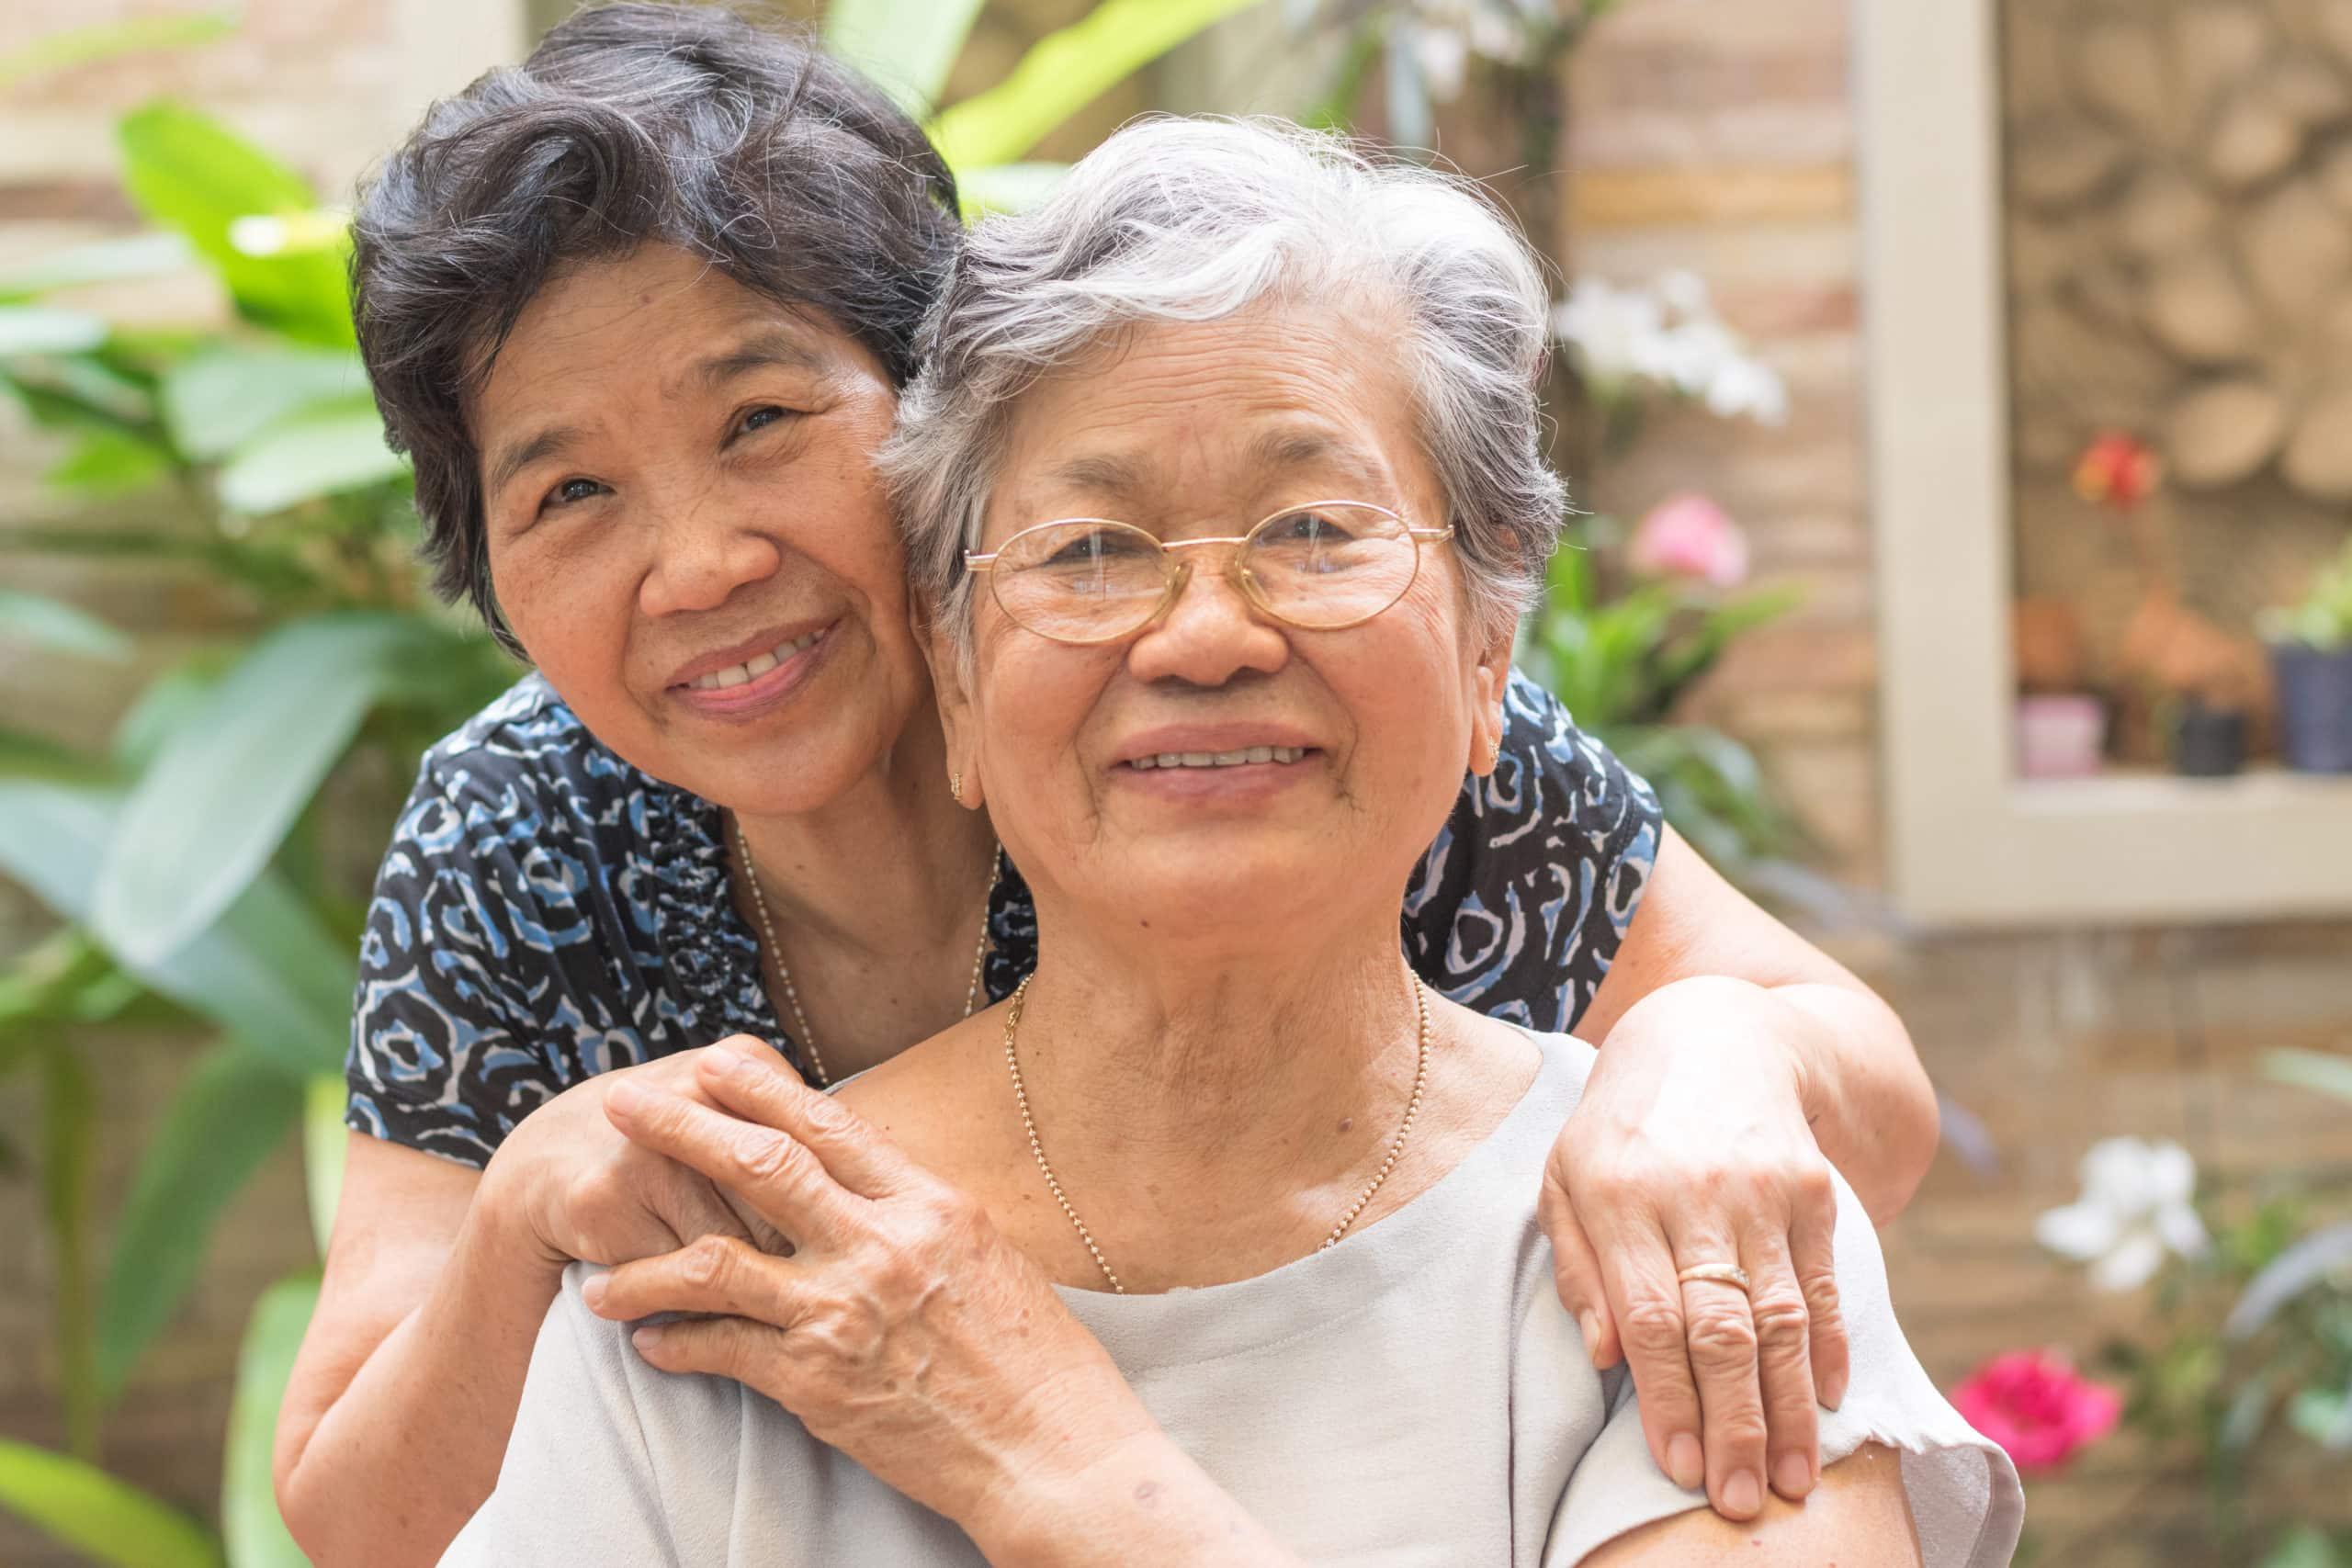 The Schmieding Home Caregiver Training Program, a program of the University of Arkansas for Medical Sciences (UAMS), is offering free Respite Volunteer Training on July 29 in Texarkana, Arkansas.